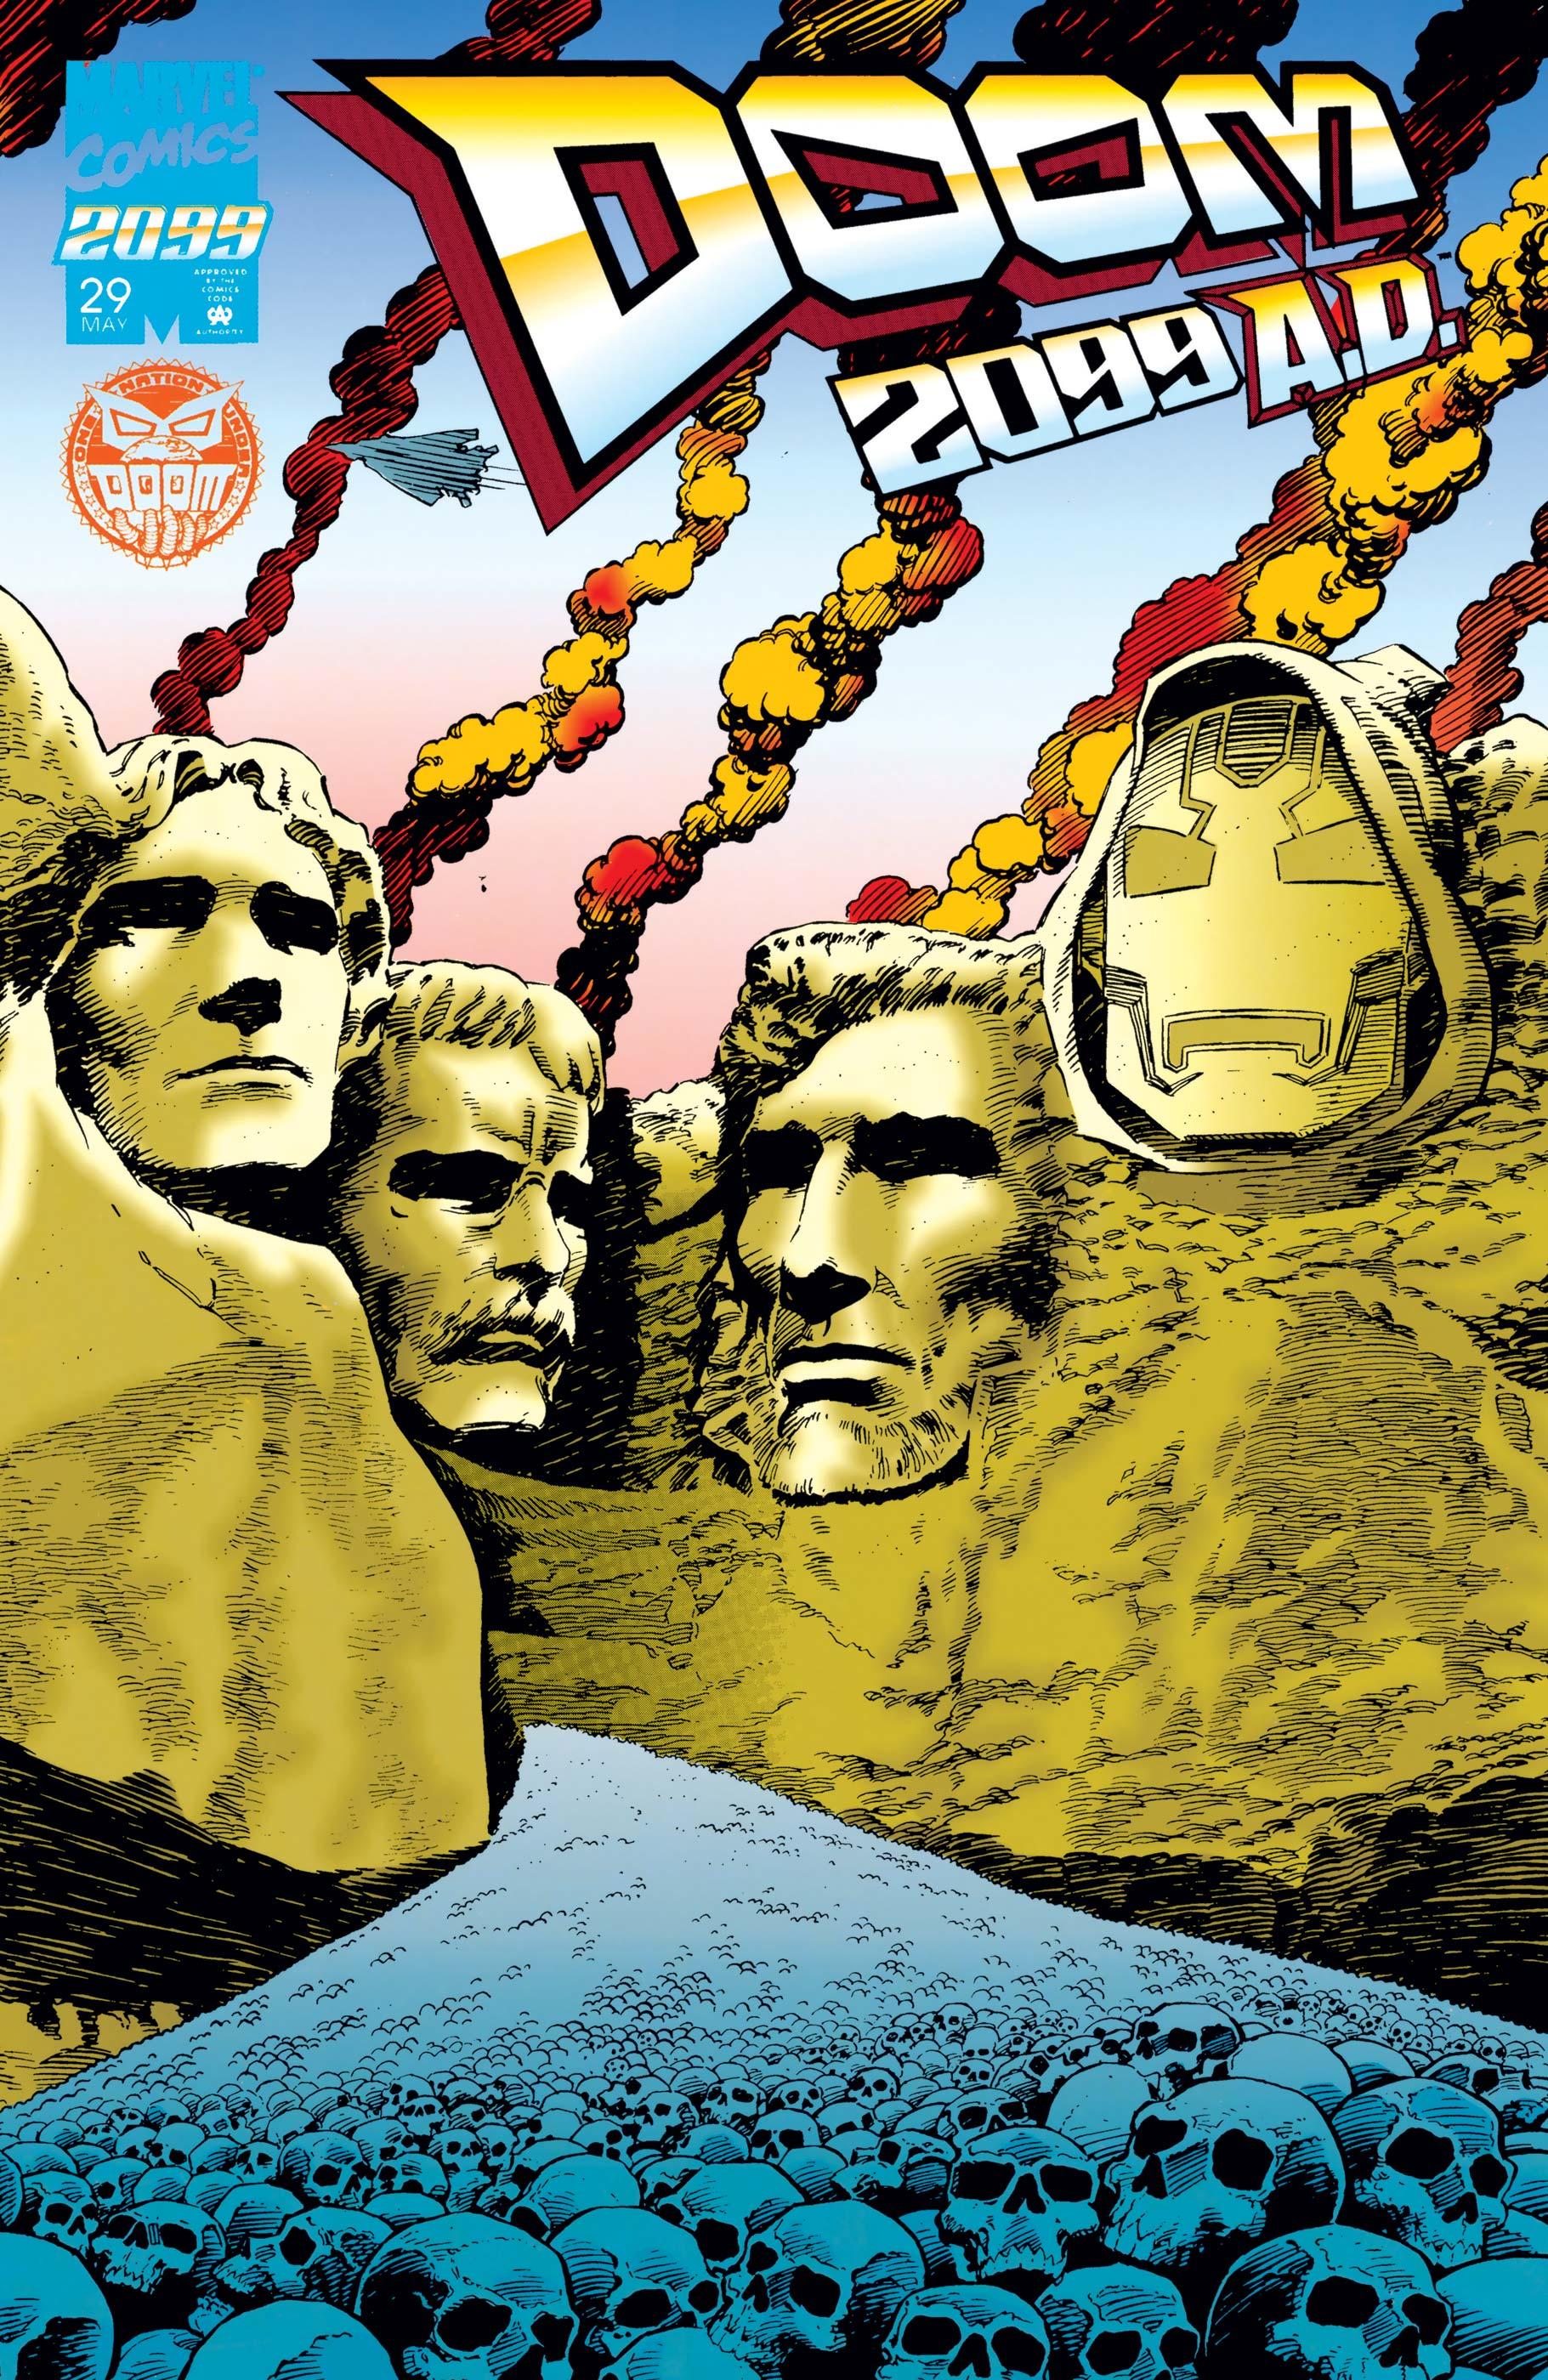 Doom 2099 (1993) #29